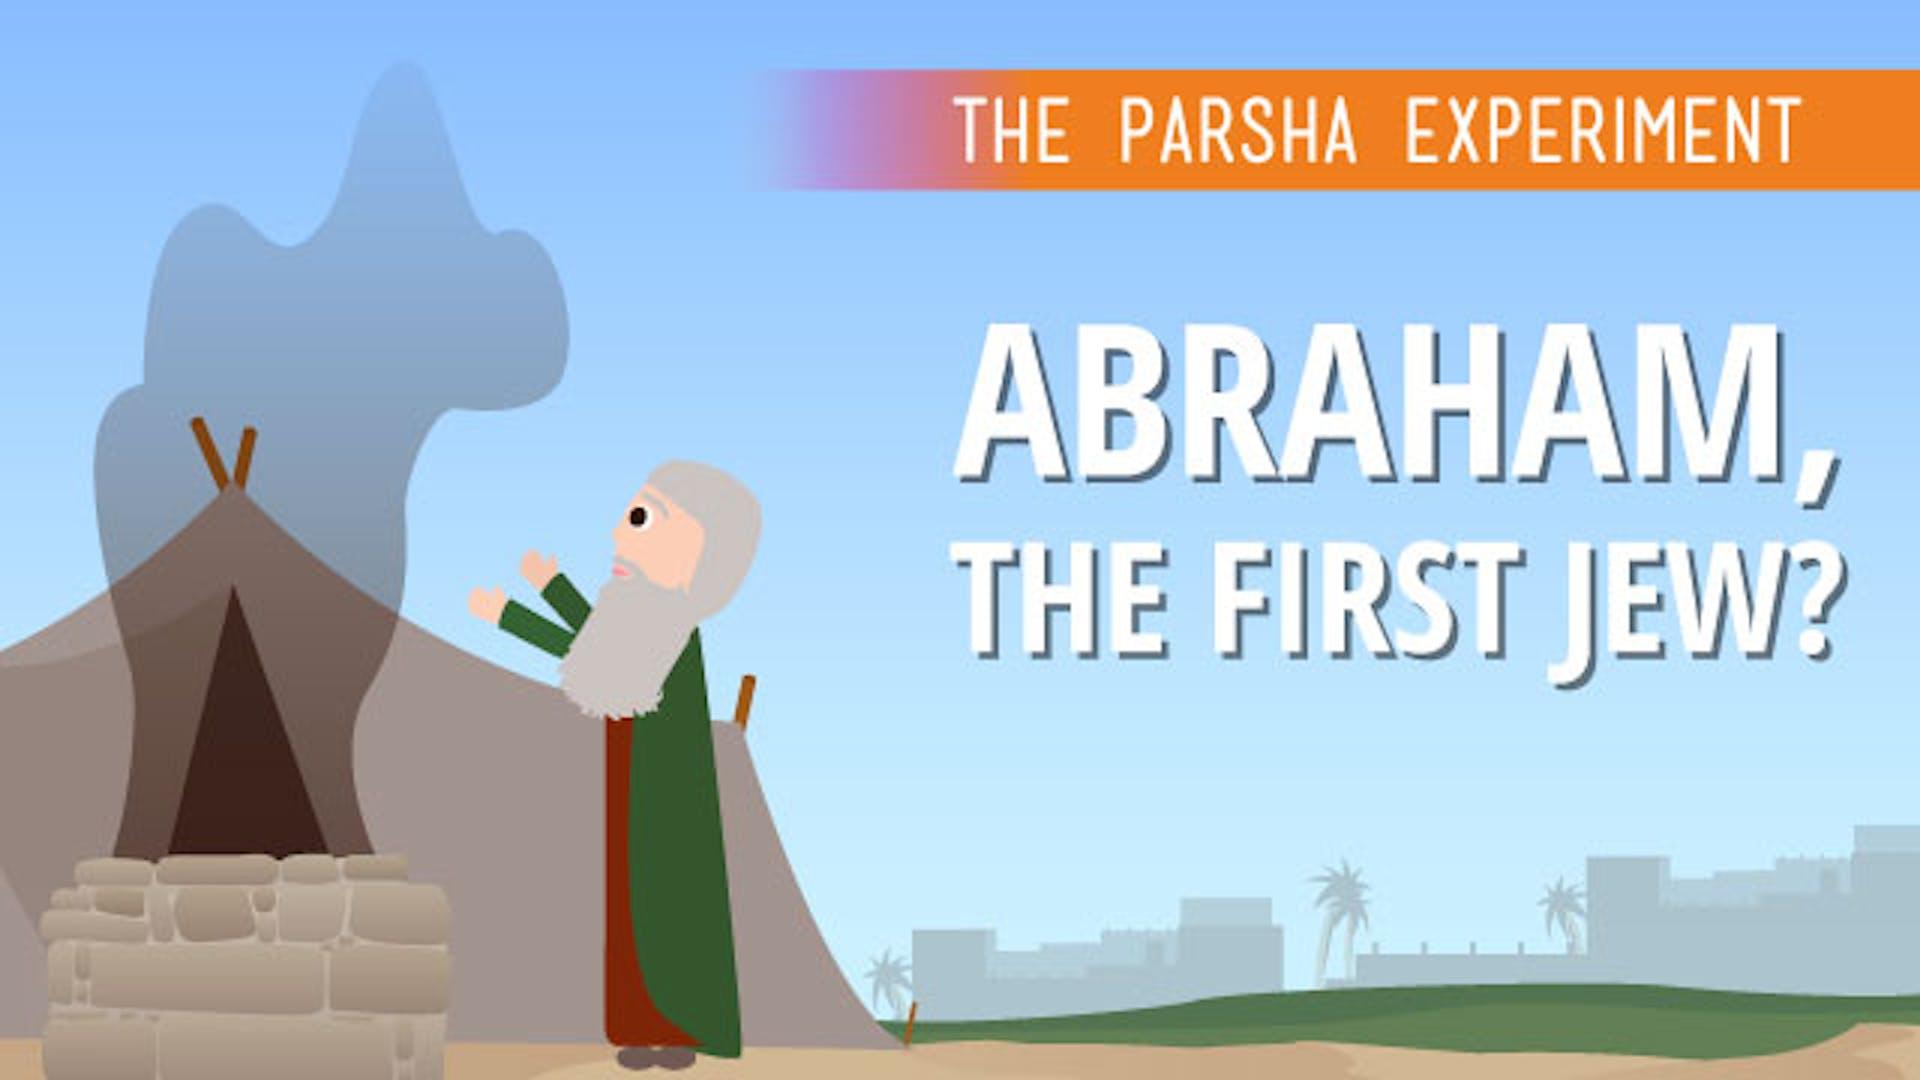 Abraham's Character Traits Story